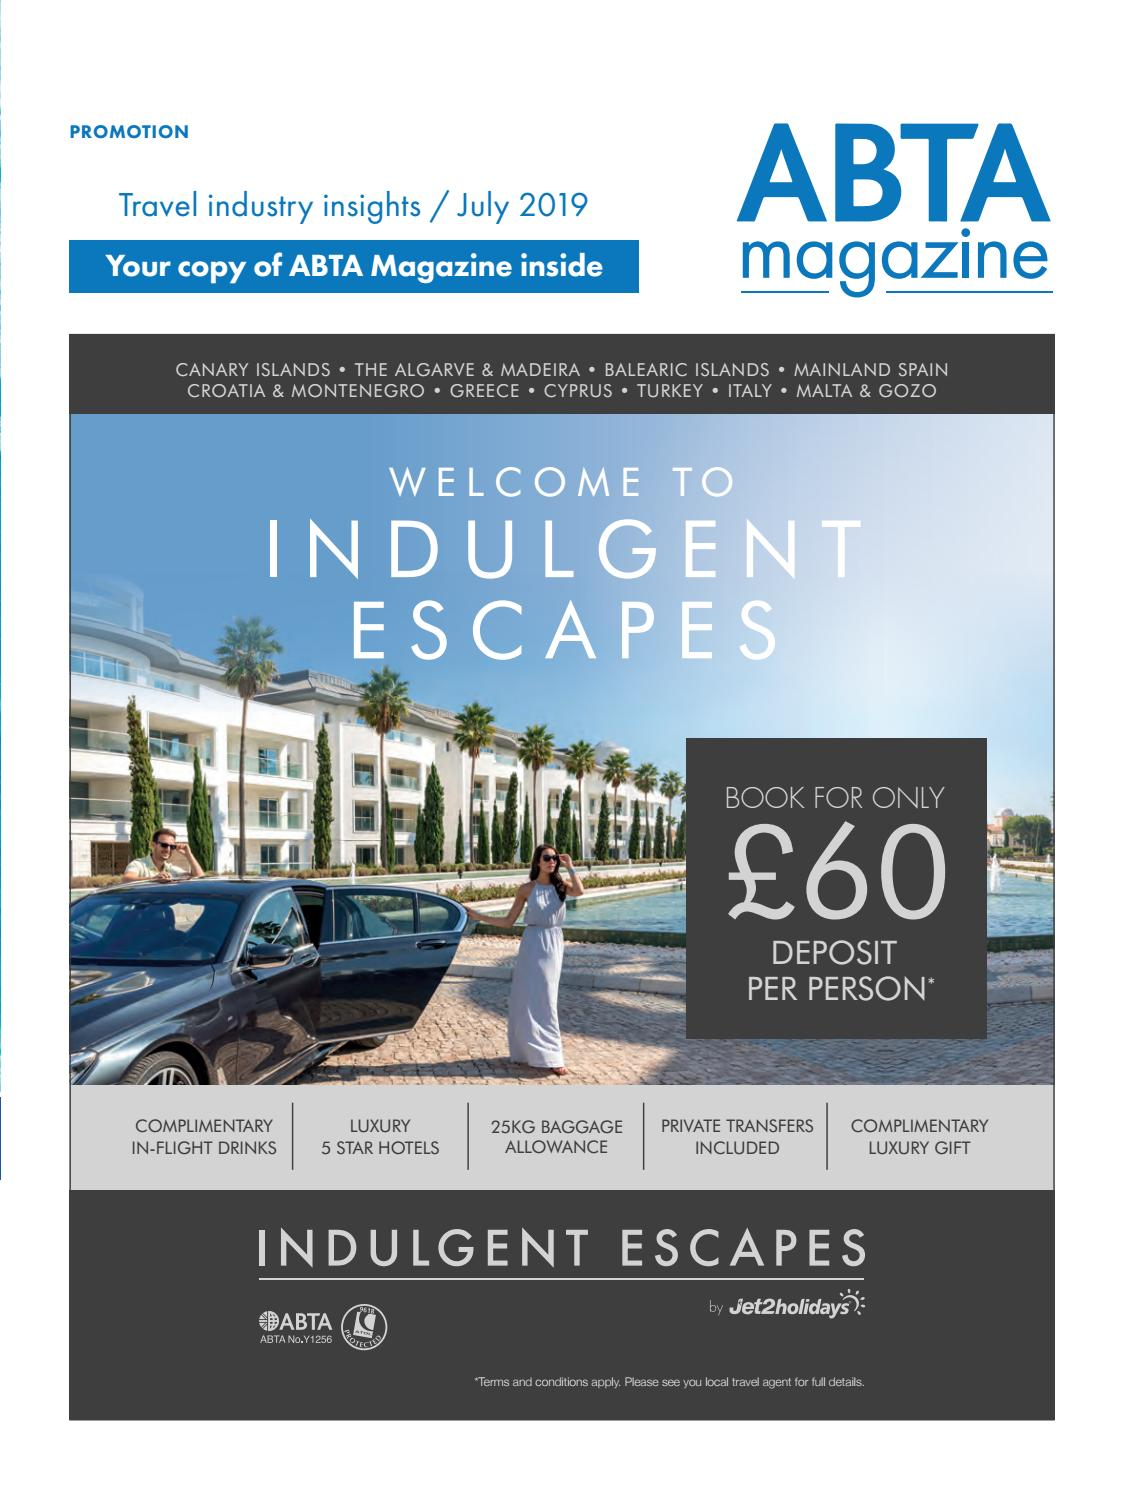 ABTA Magazine – July 2019 by ABTA Magazine - issuu